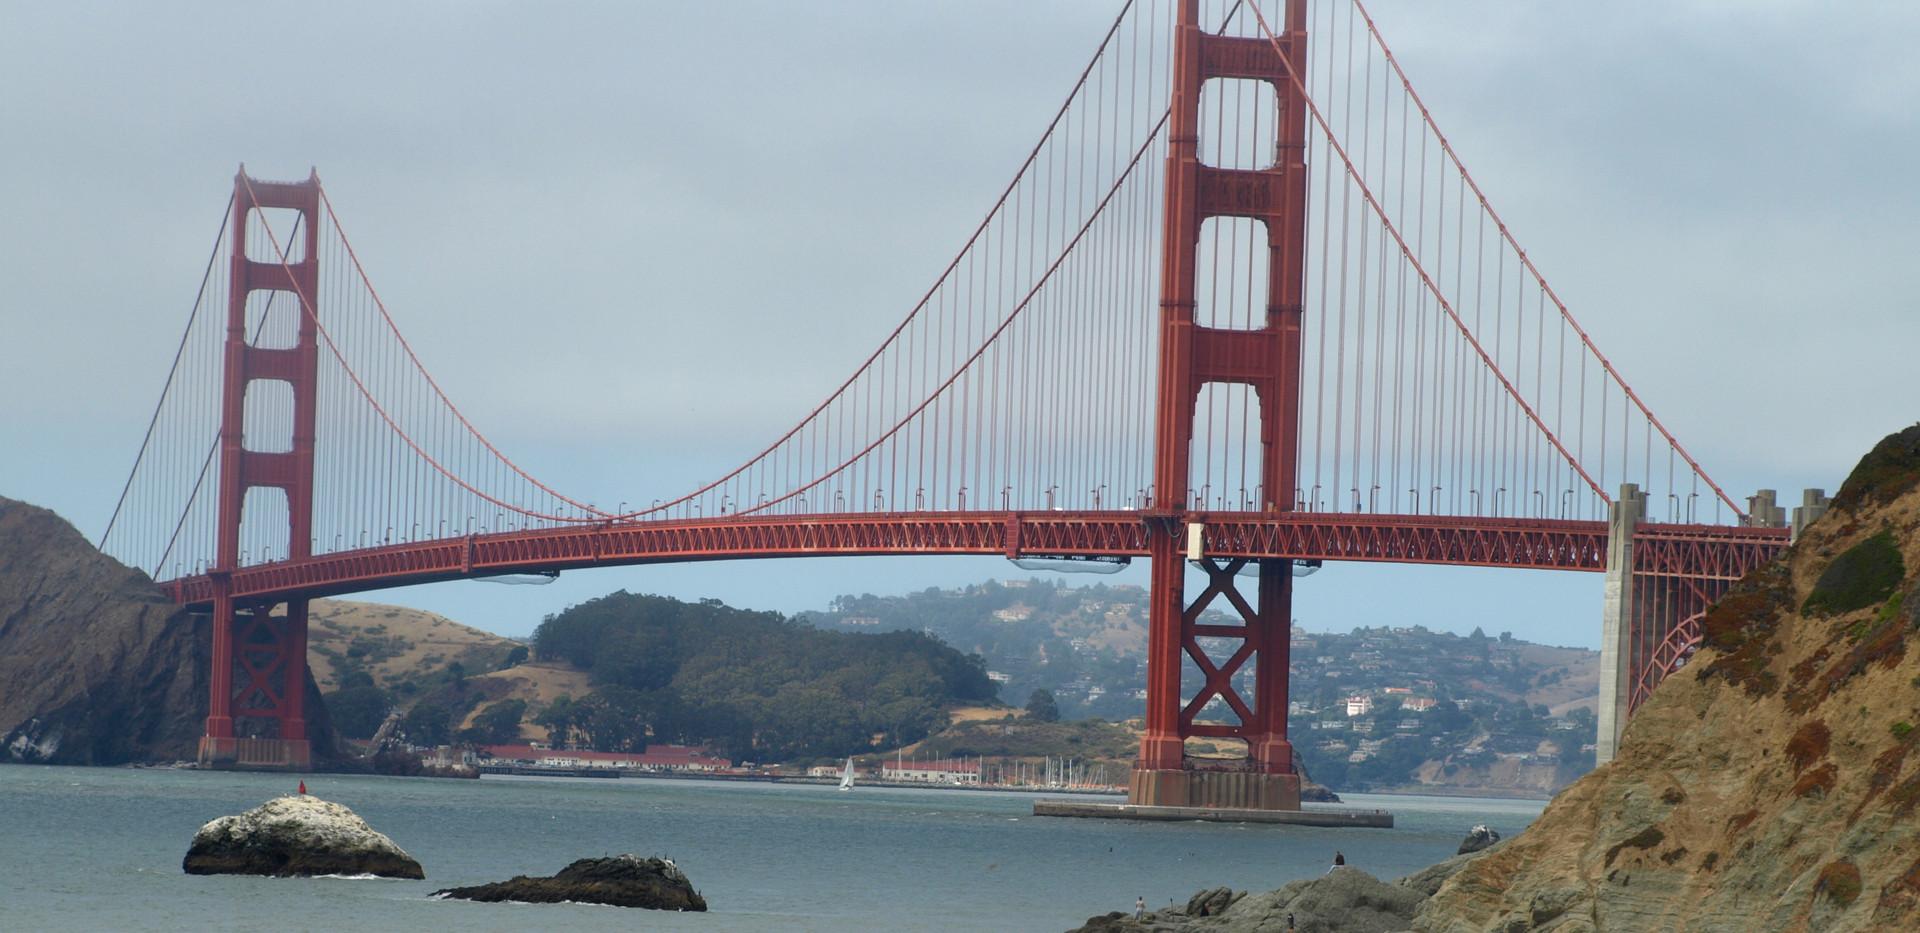 Baker Beach bridge view